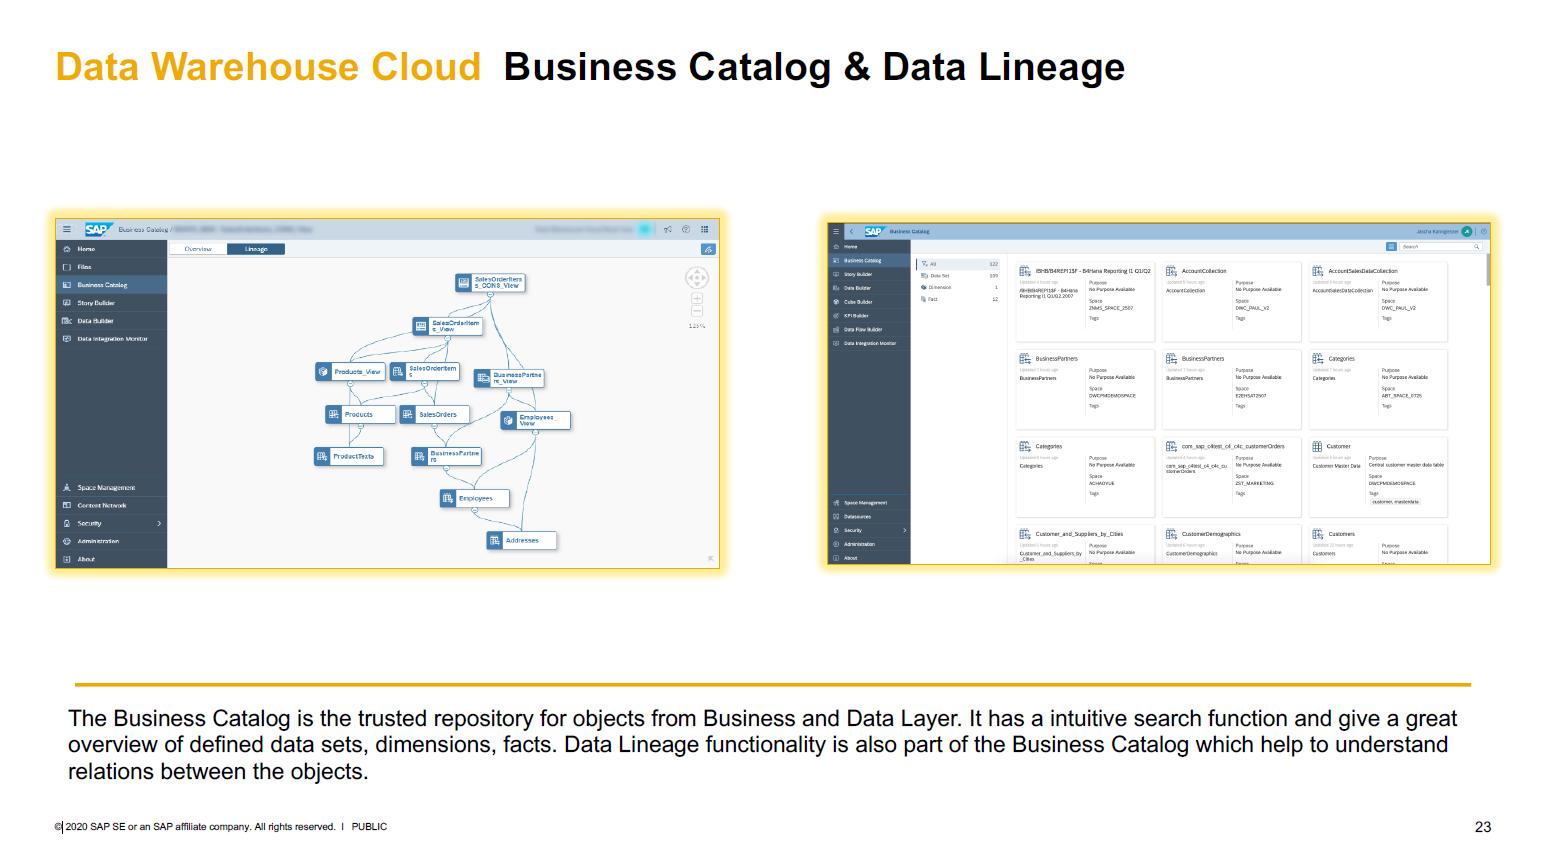 SAP Data Warehouse Cloud Business Catalog